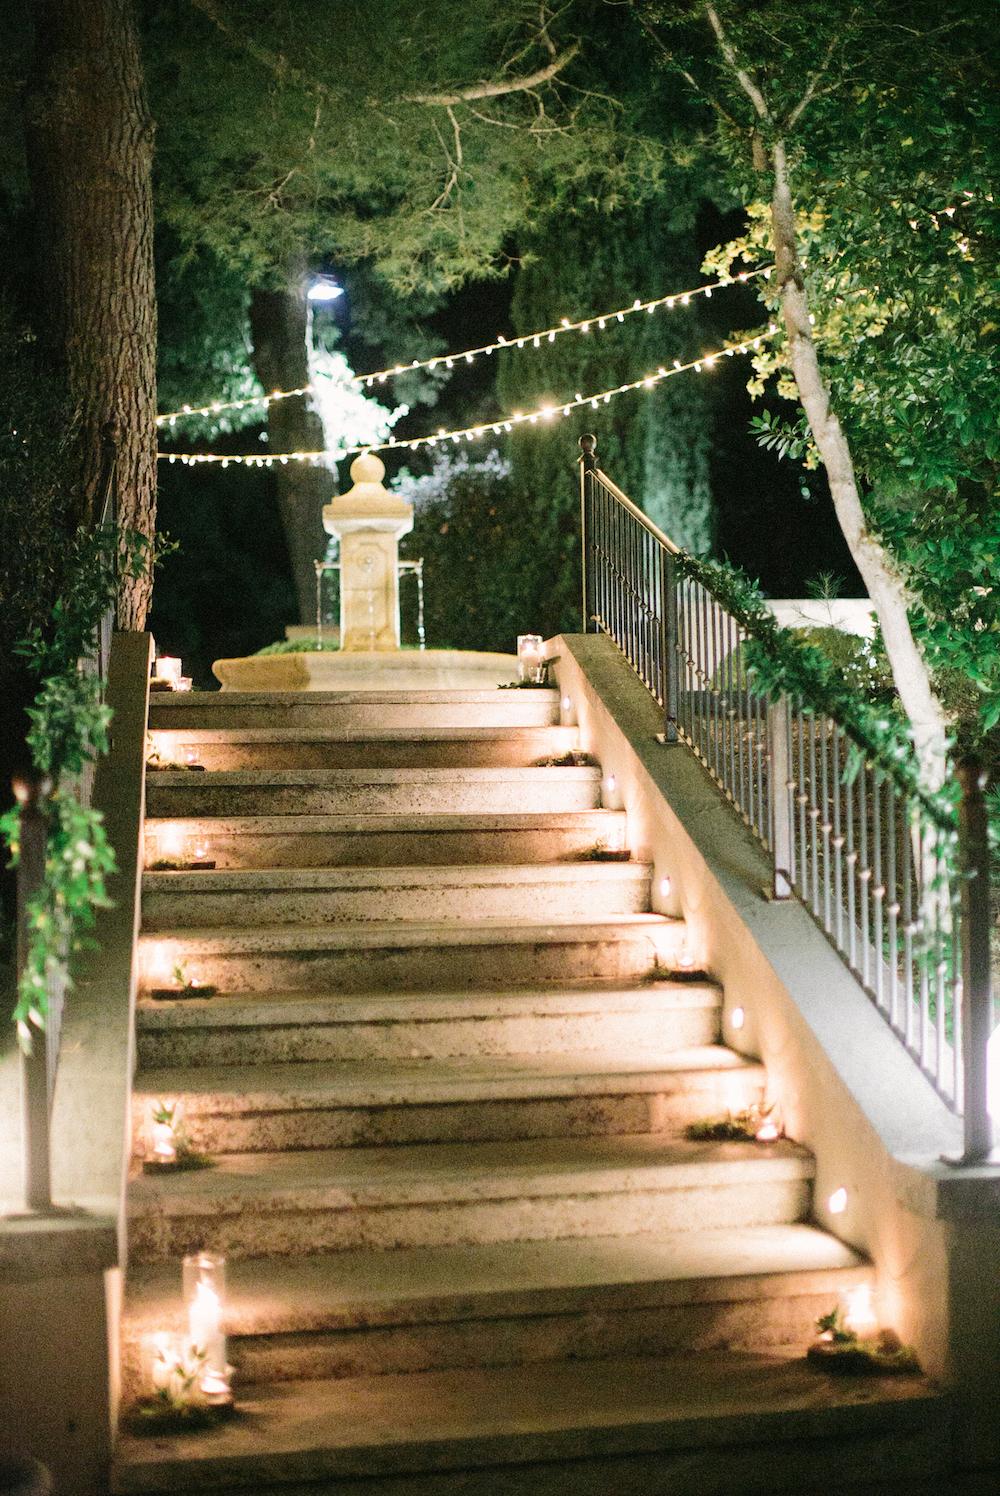 ©-saya-photography-studio-ohlala-wedding-photographer-photographe-mariage-chateau-de-la-tour-vaucros-avignon-281.jpg